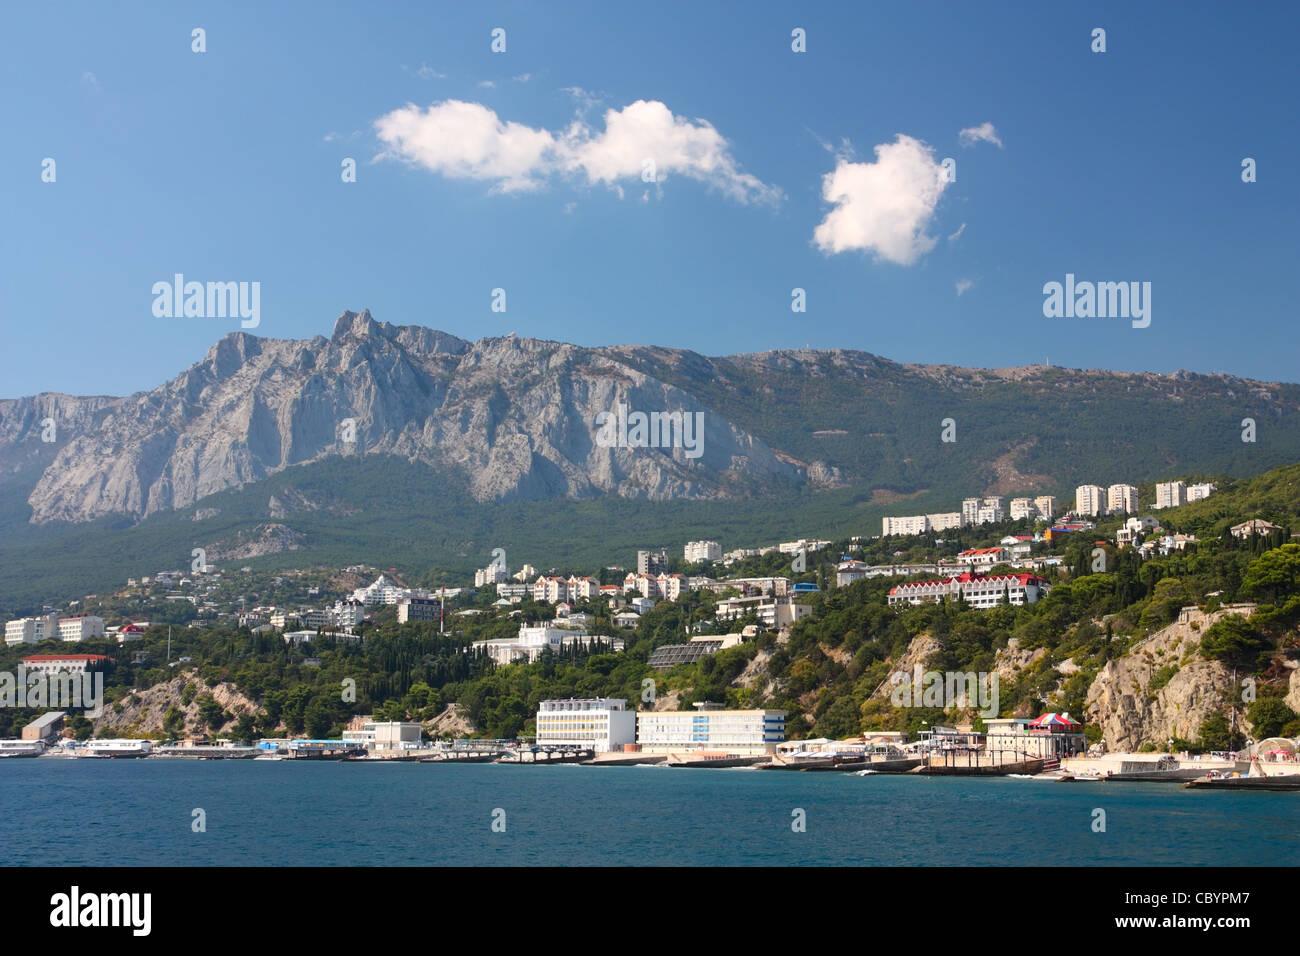 Crimea. Village Mishor, at the foot of Mount Ai-Petri - Stock Image